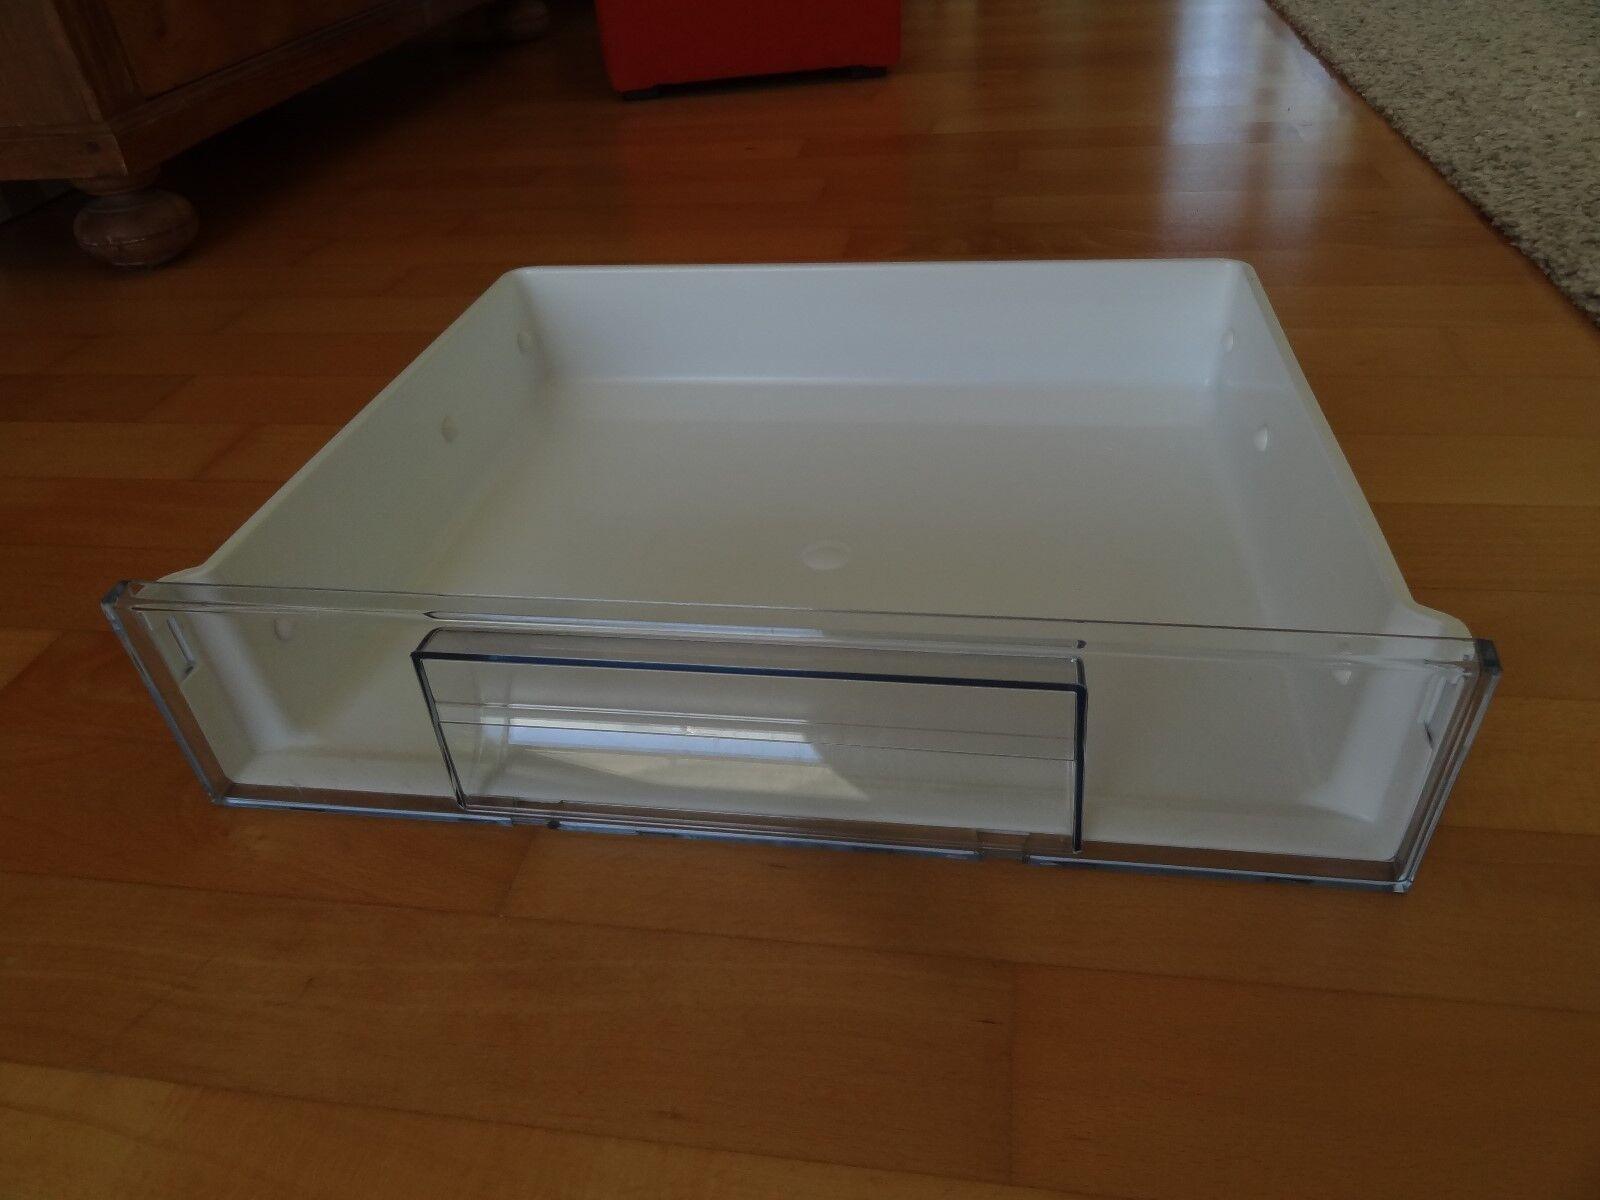 Aeg Kühlschrank Produktnummer : Aeg electrolux kühlschrank ersatzteil nr